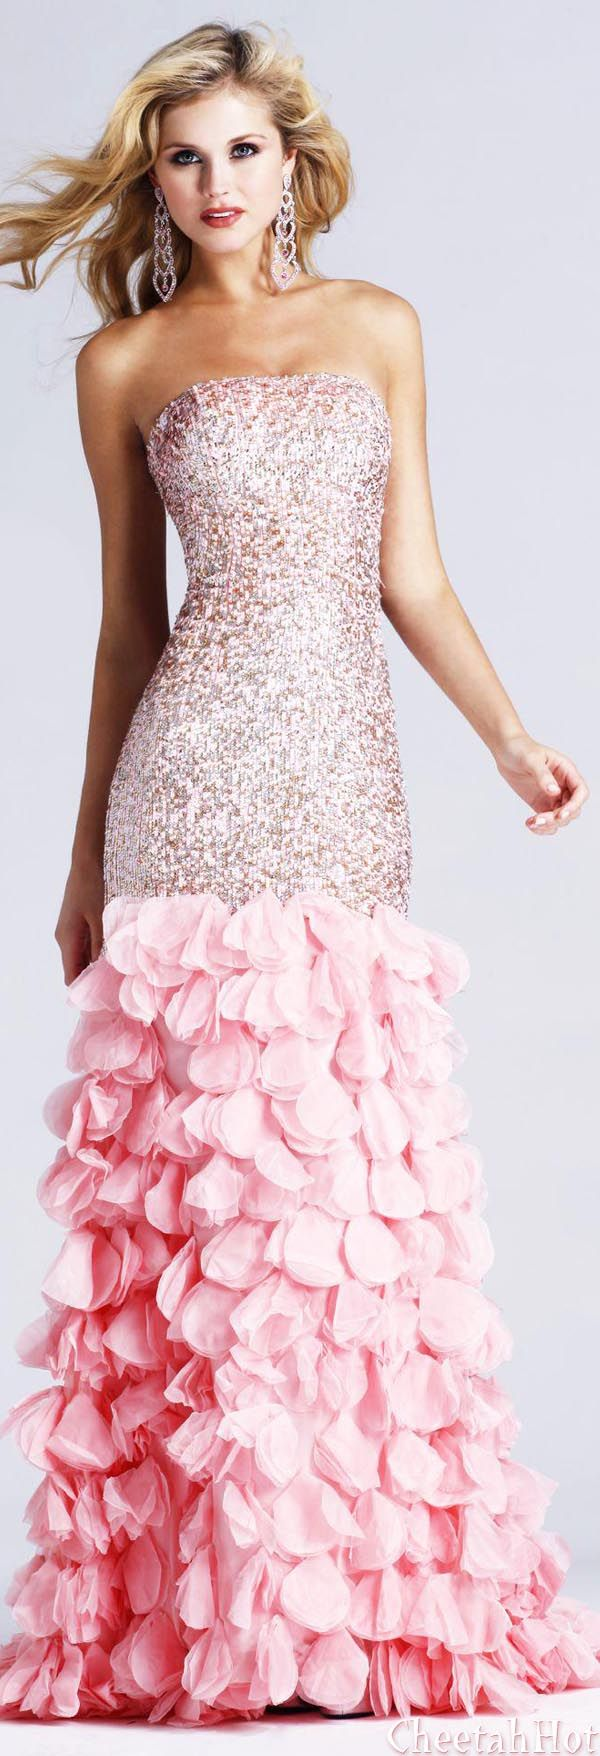 SHERRI HILL - Authentic Designer - Stunning Strawberry Gown